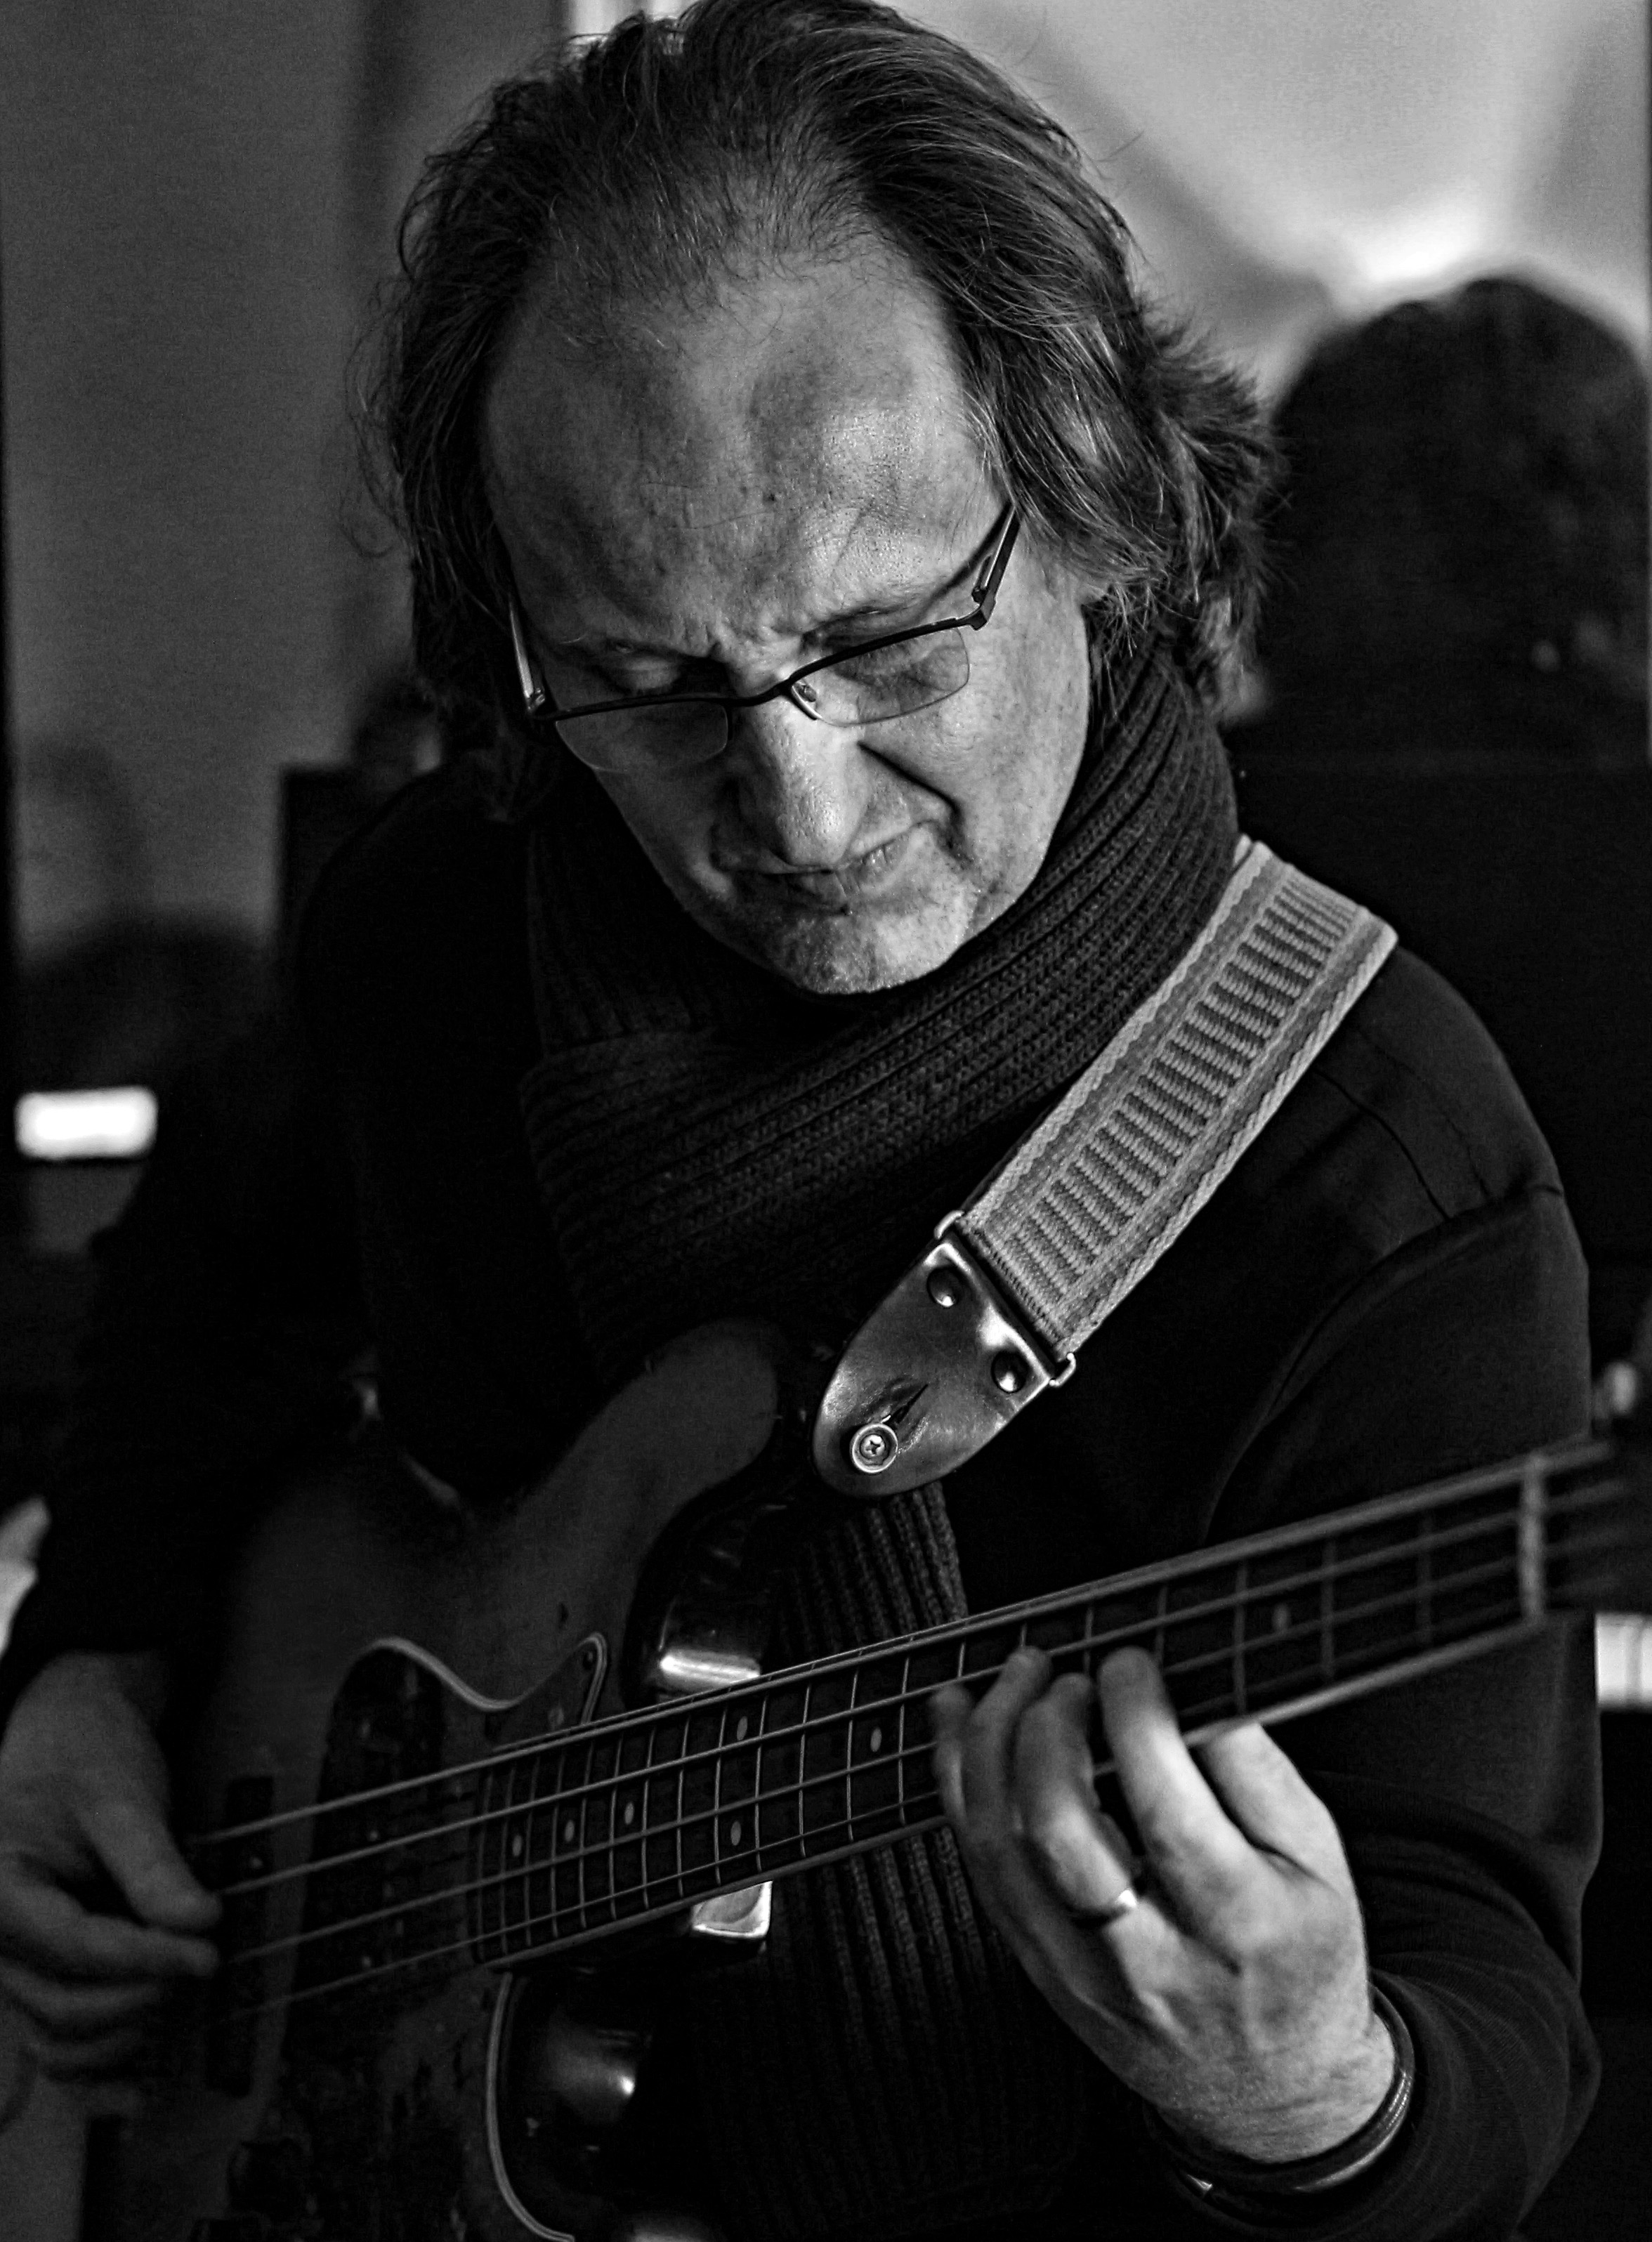 Serge Dacosse